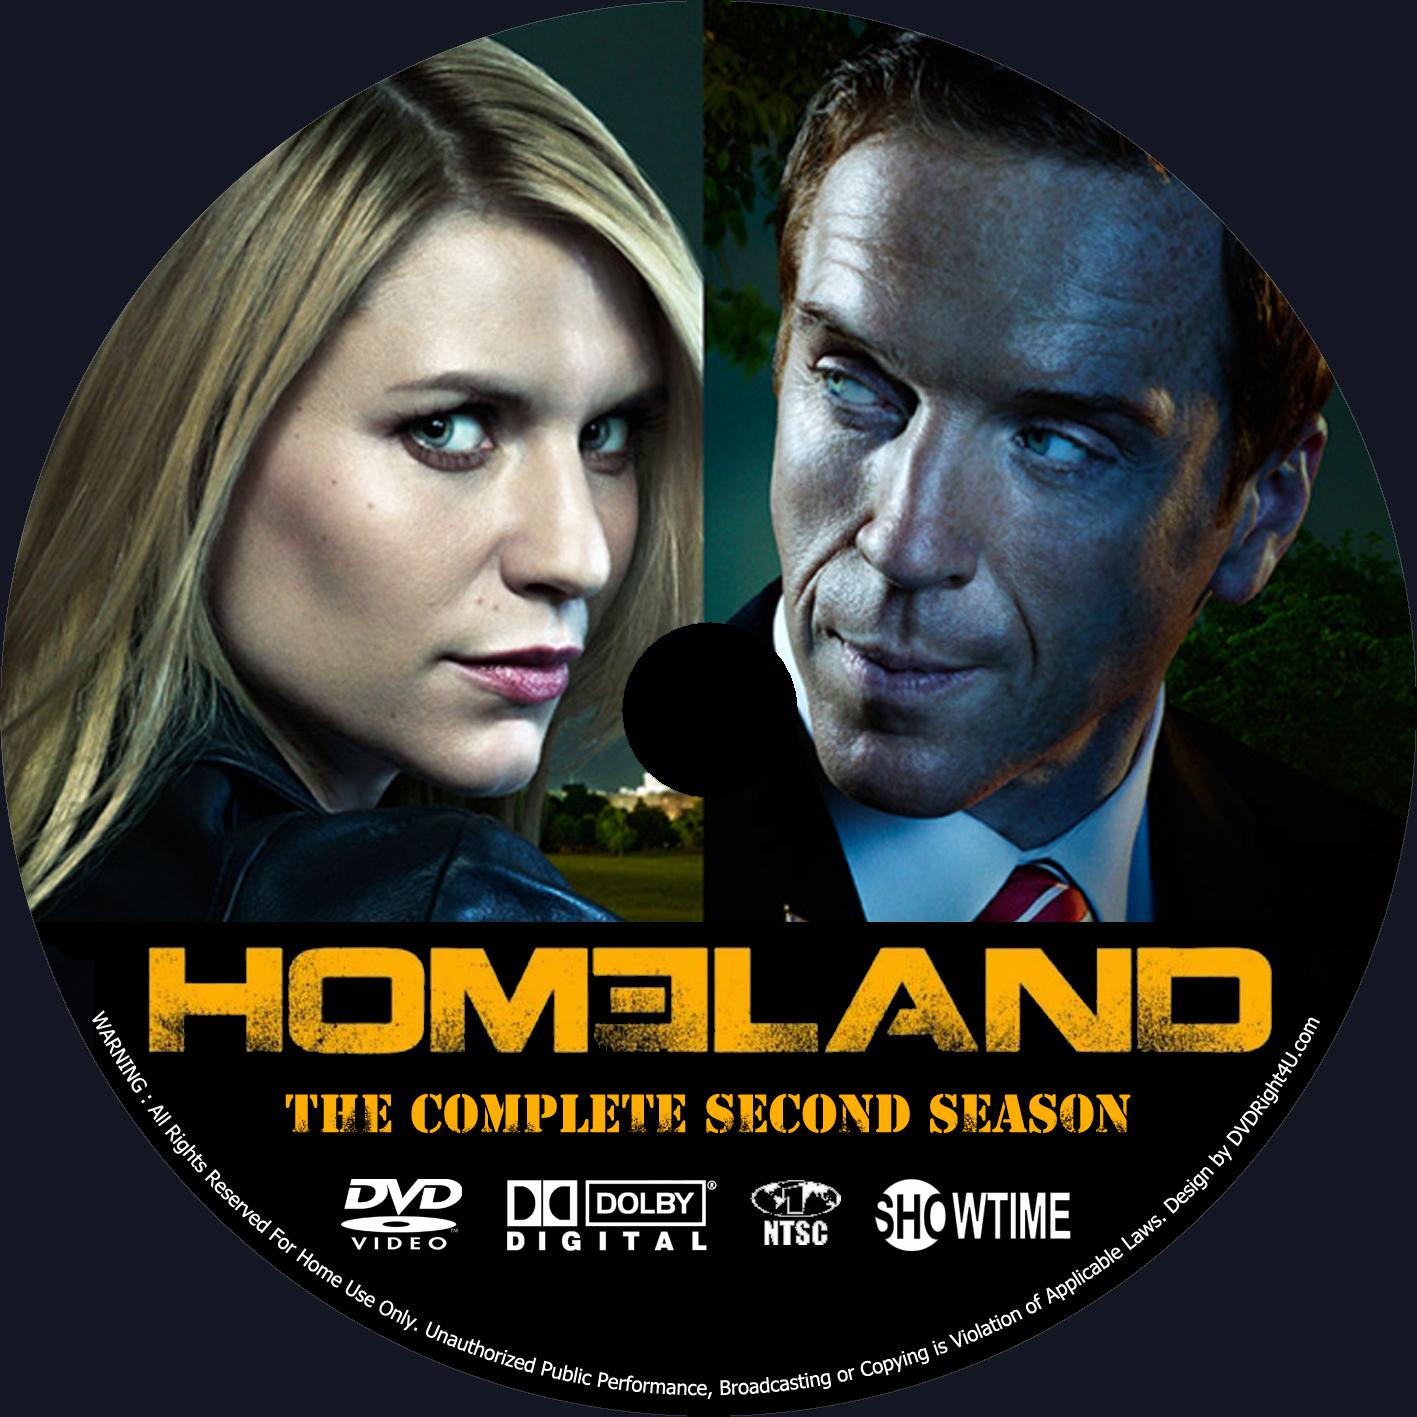 Homeland season 3 on dvd - Loews miami beach